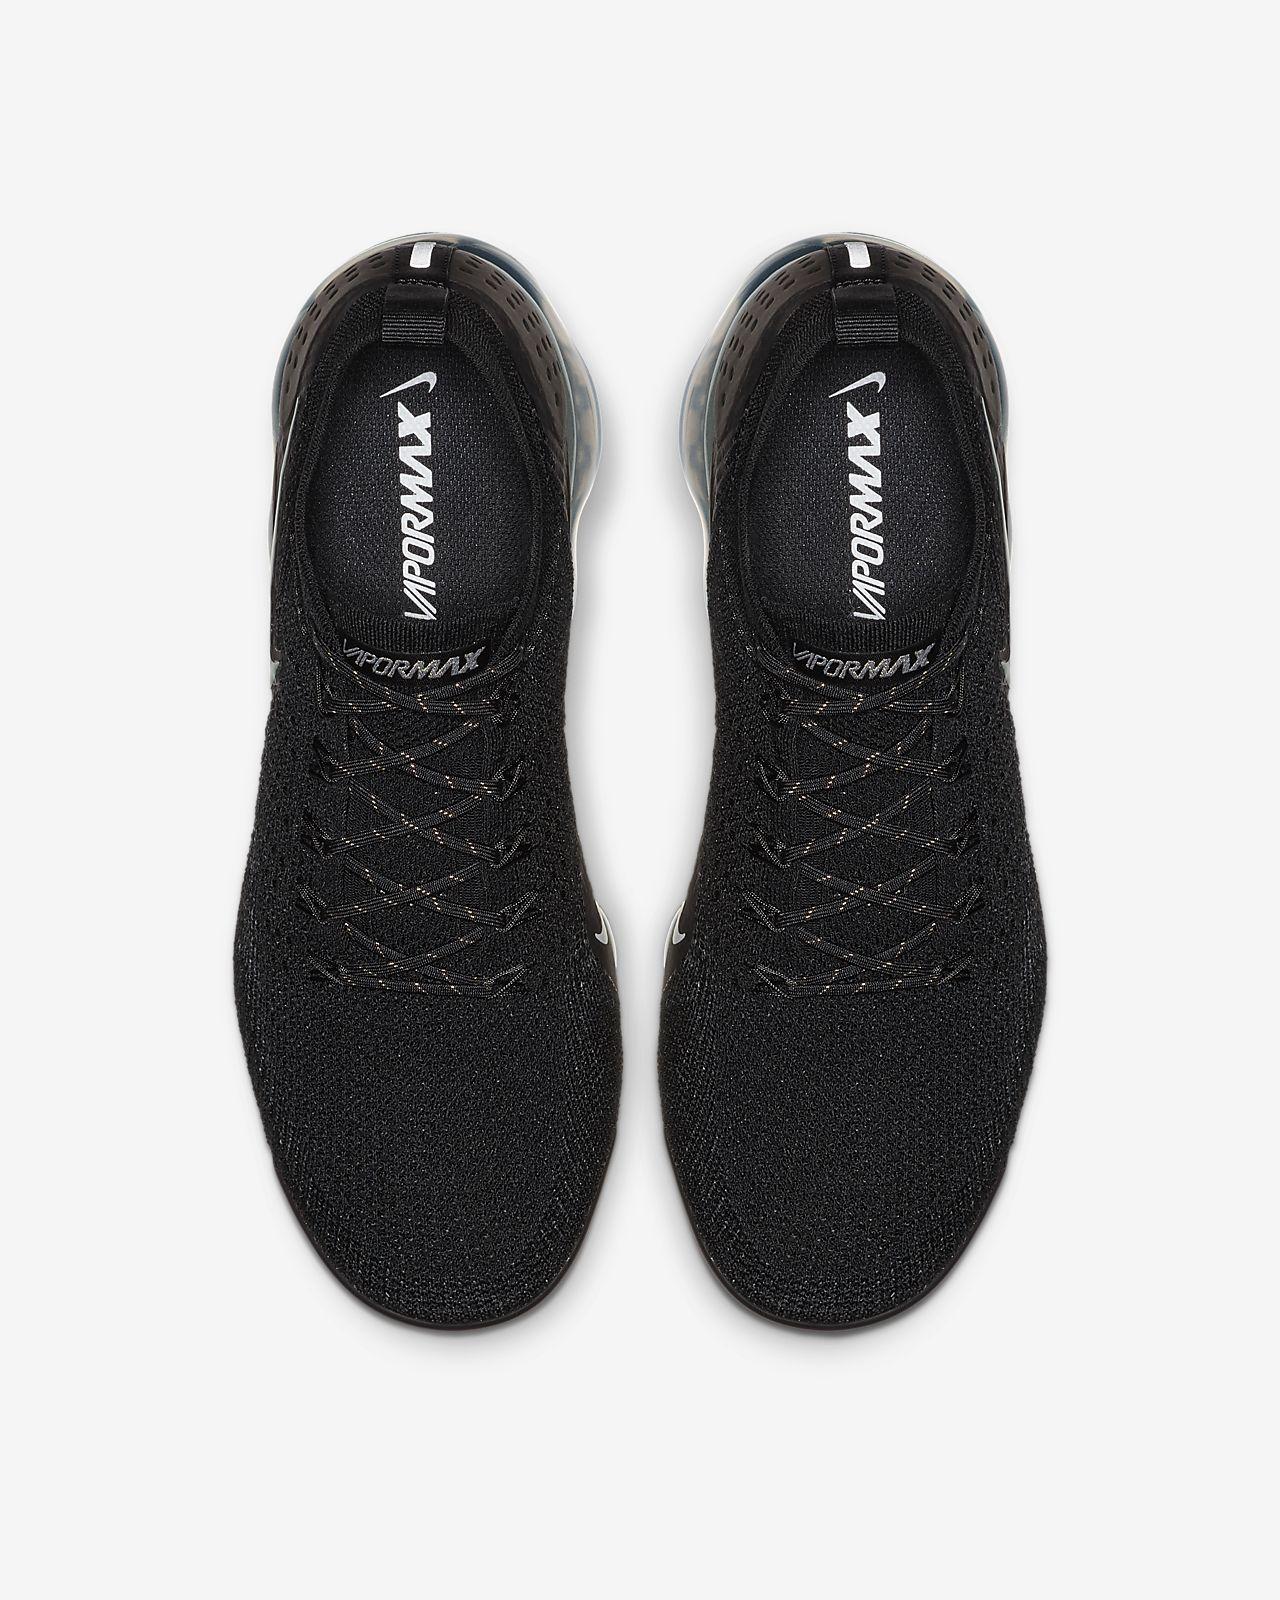 8437d97838f6 Nike Air VaporMax Flyknit 2 Shoe. Nike.com GB